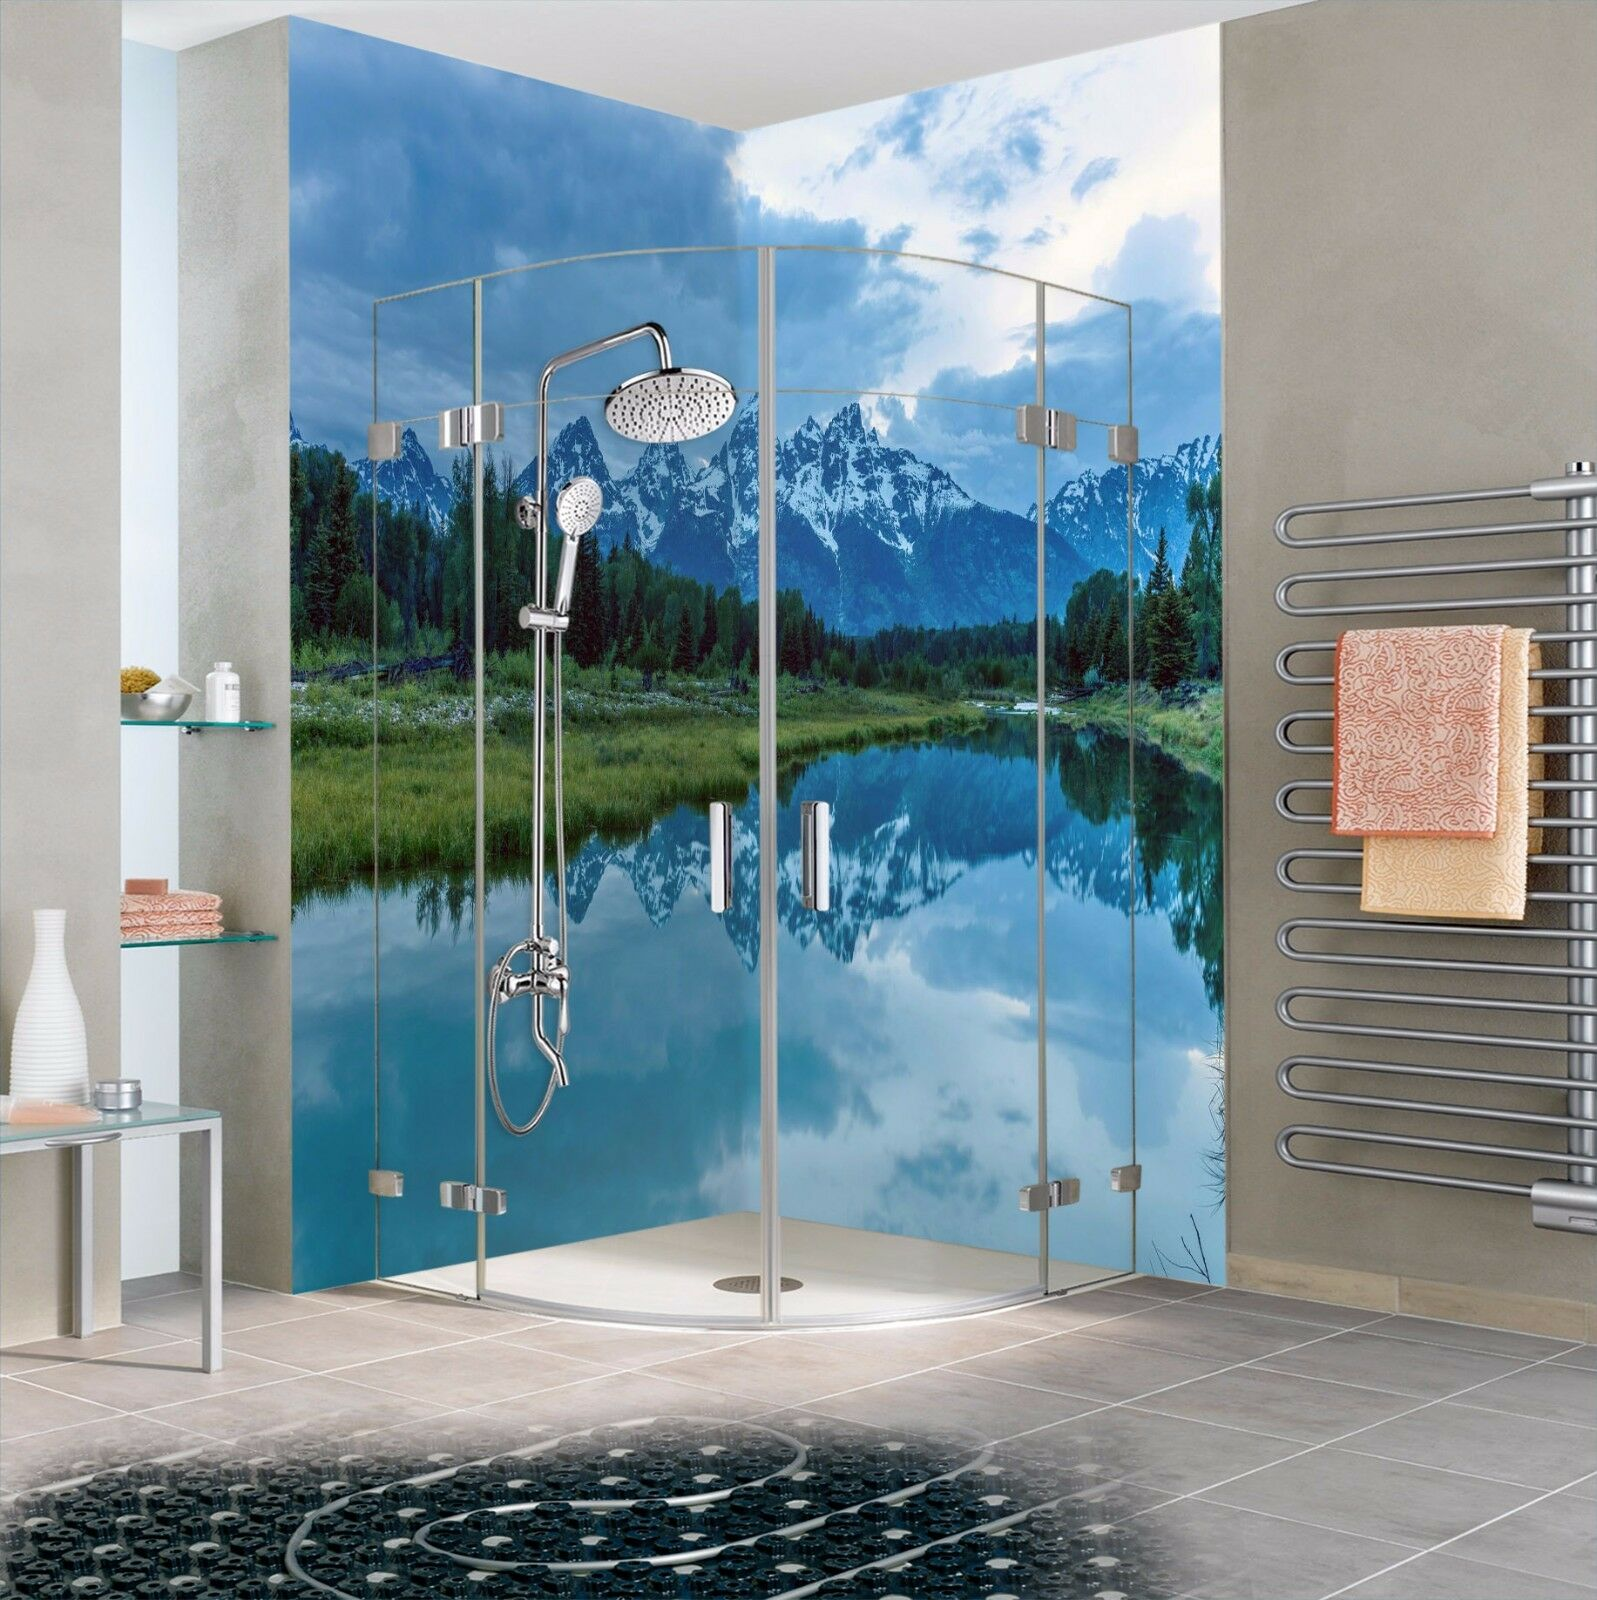 3D Mountain Lake 574 WallPaper Bathroom Print Decal Wall Deco AJ WALLPAPER AU